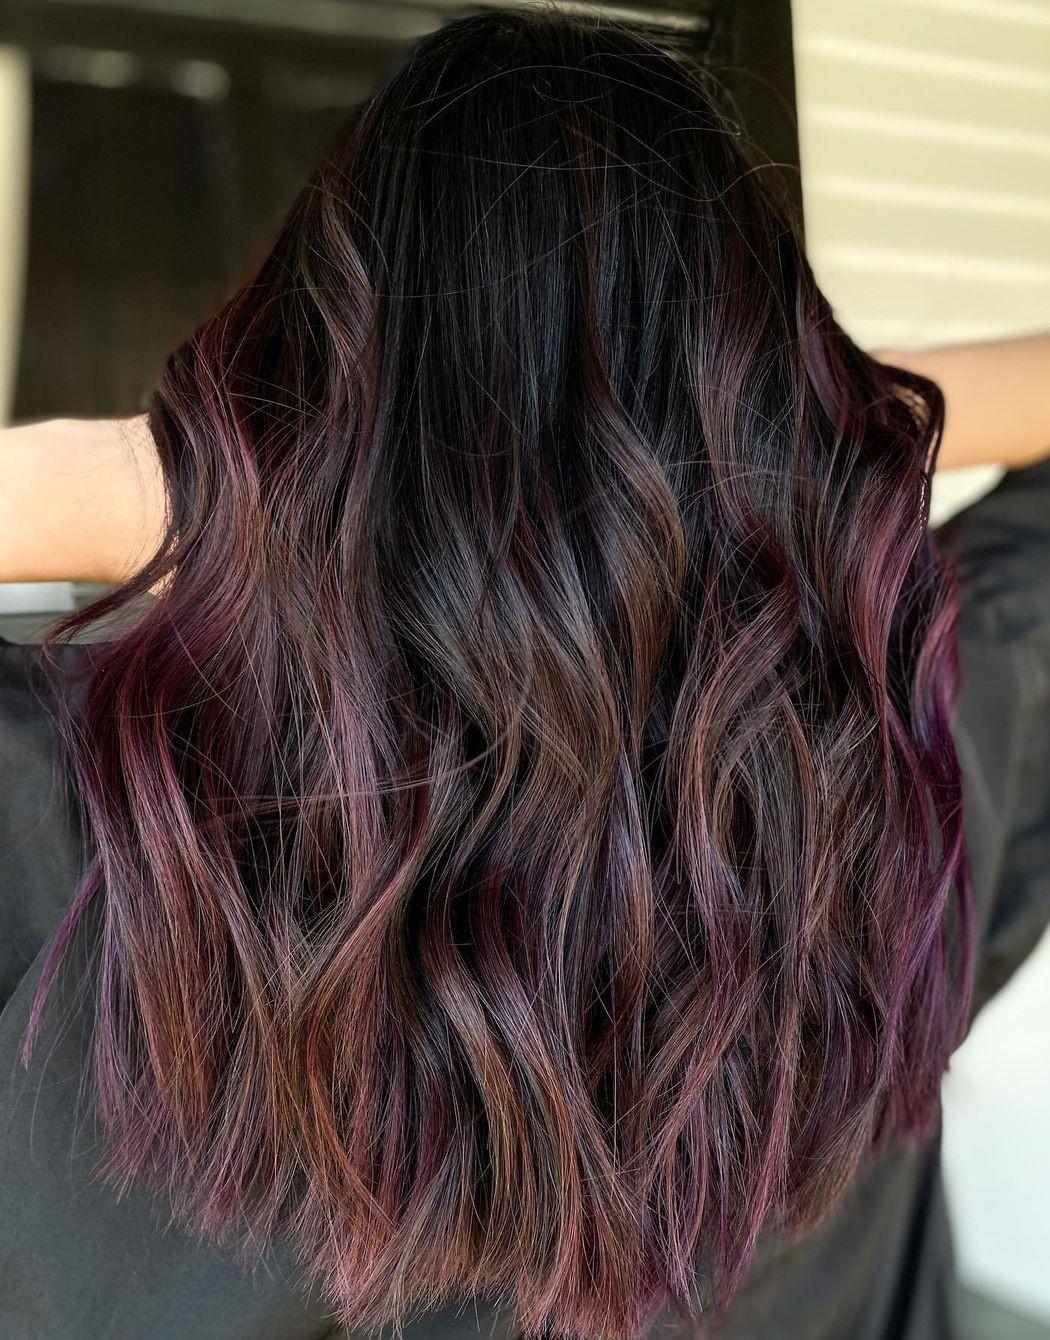 Chocolate Hair with Subtle Plum Highlights